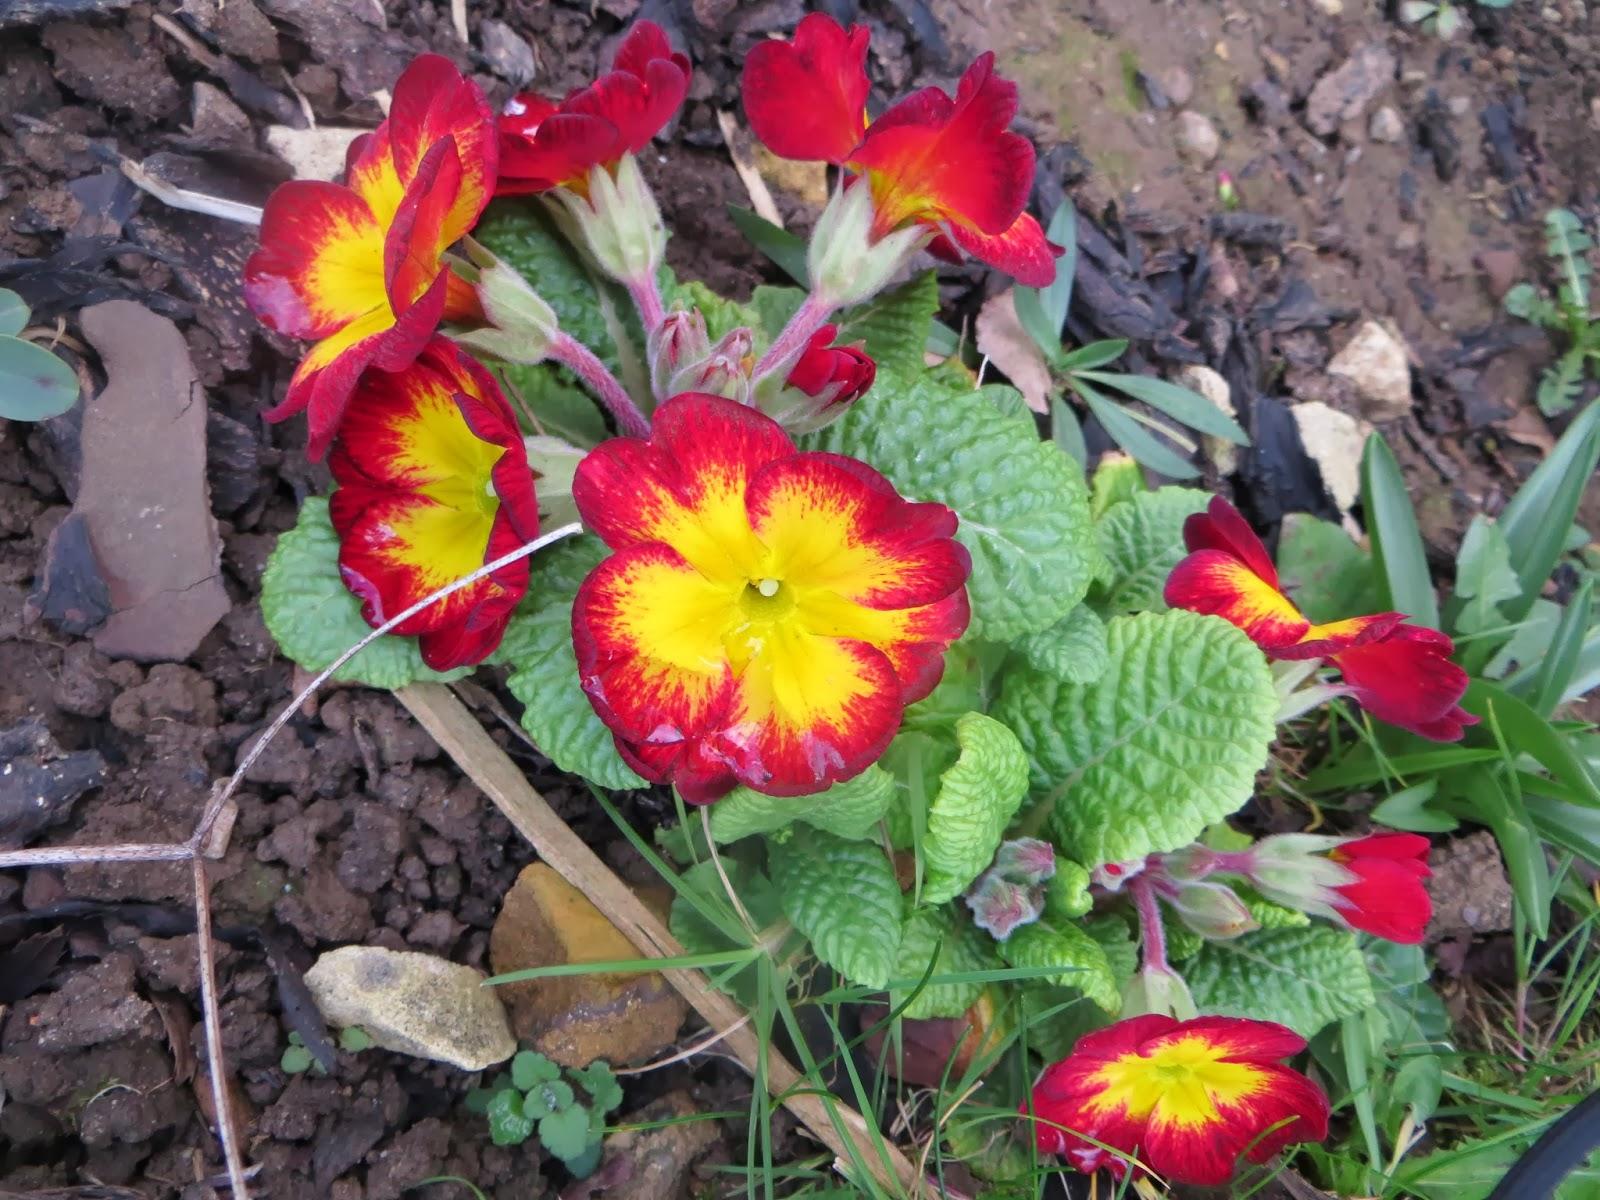 Spring flowers. primroses